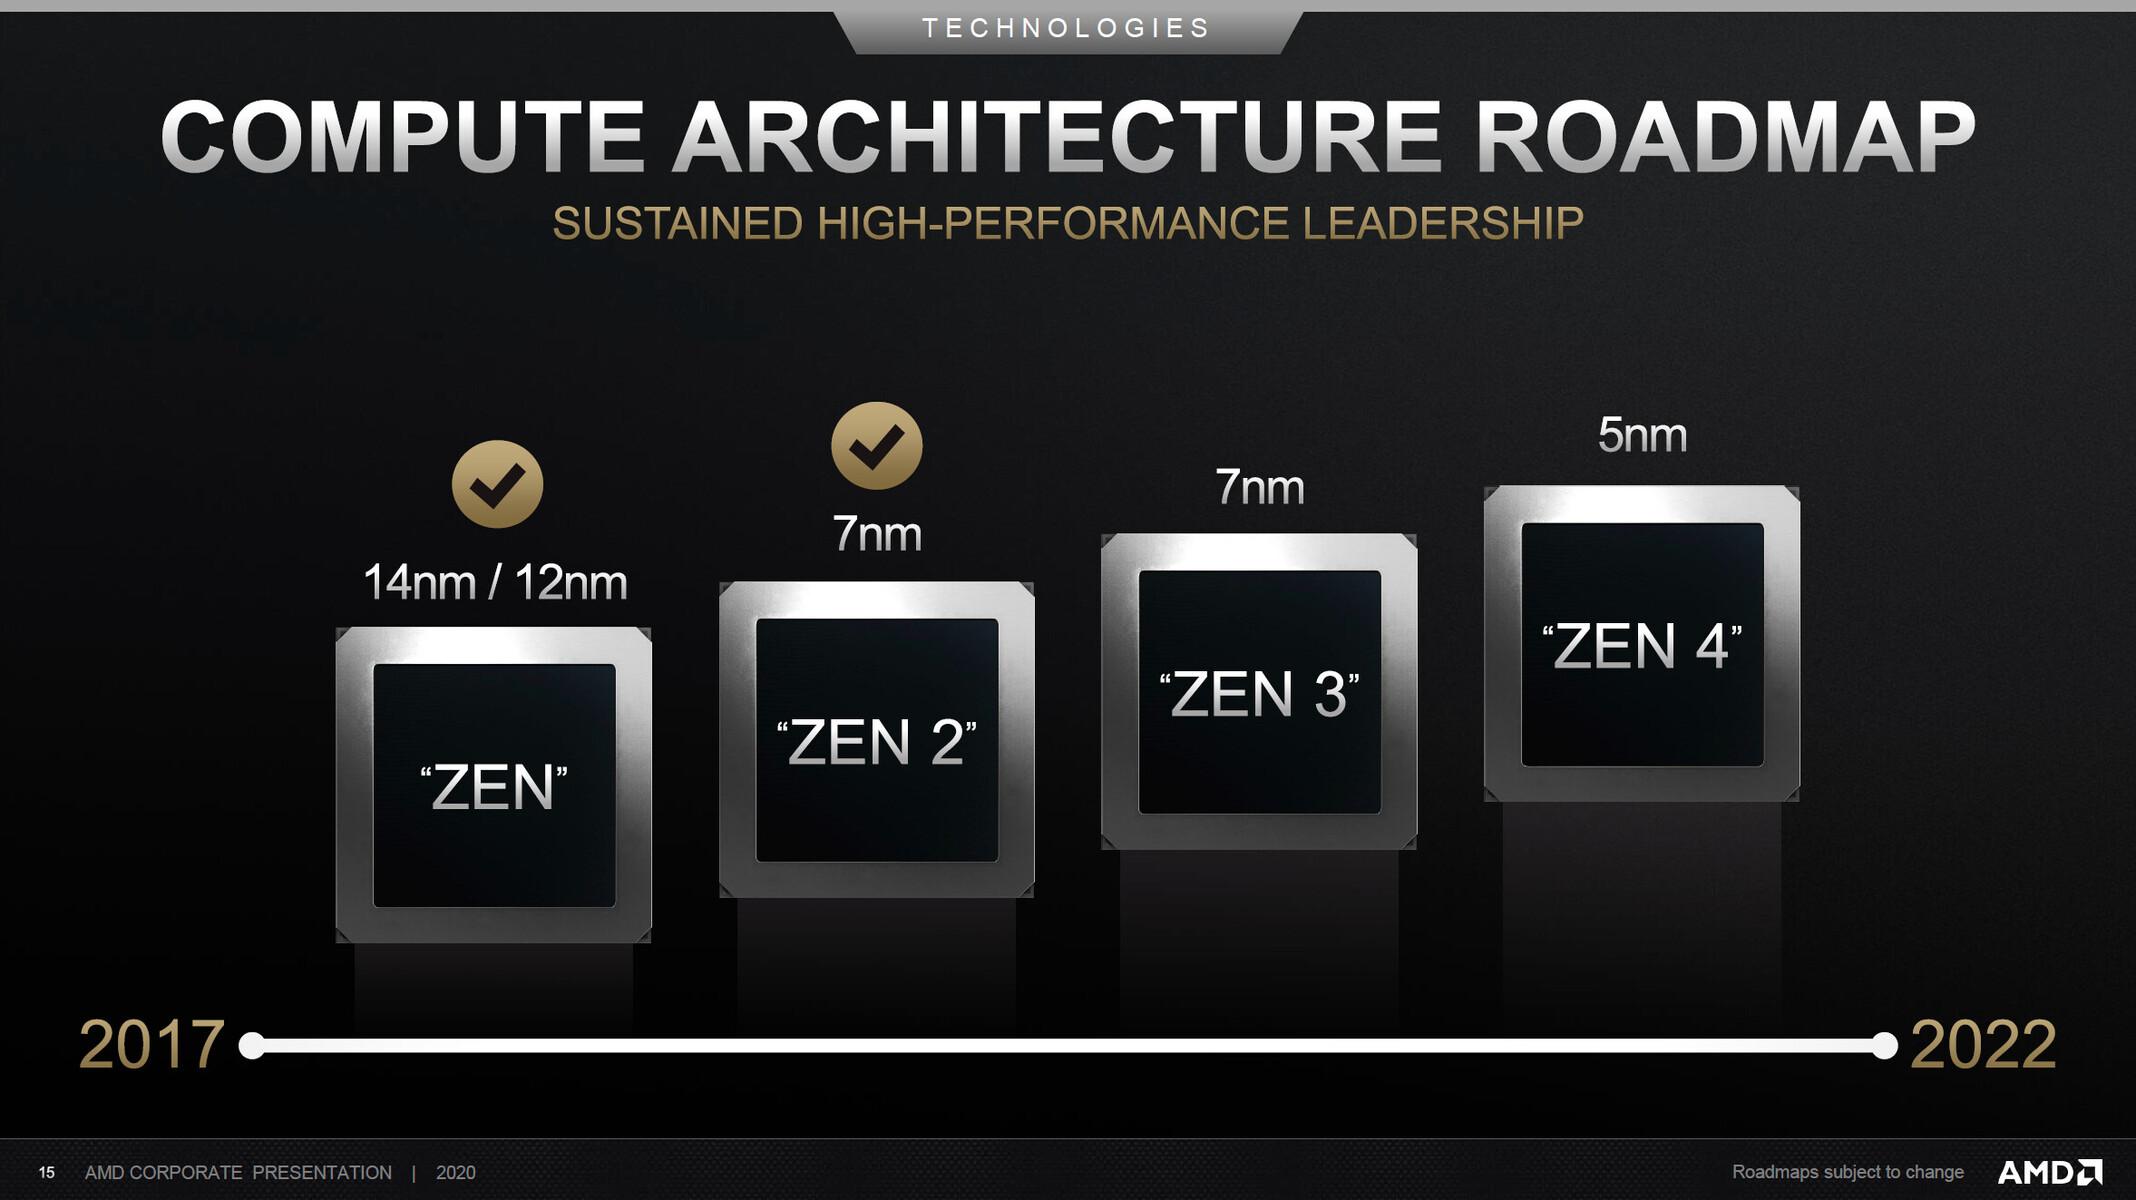 jzrbtz2lxwvclafs ลือ!! ซีพียู AMD ZEN4 ขนาด 5nm ประสิทธิภาพแรงขึ้น 40% เมื่อเทียบกับ ZEN3 และมี IPC ดีขึ้นกว่าเดิม 25% กันเลยทีเดียว